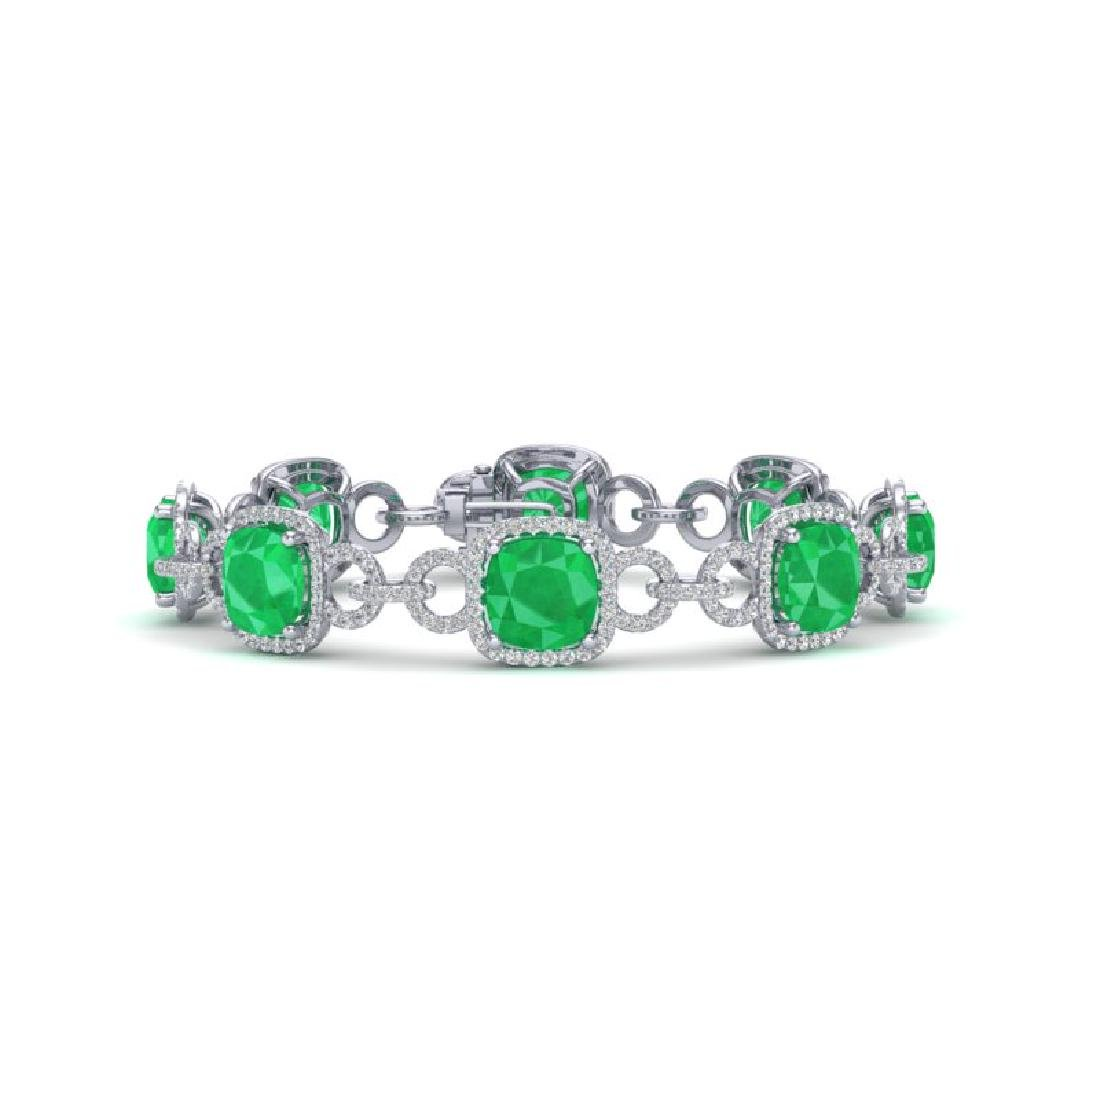 25 CTW Emerald & VS/SI Diamond Bracelet 14K White Gold